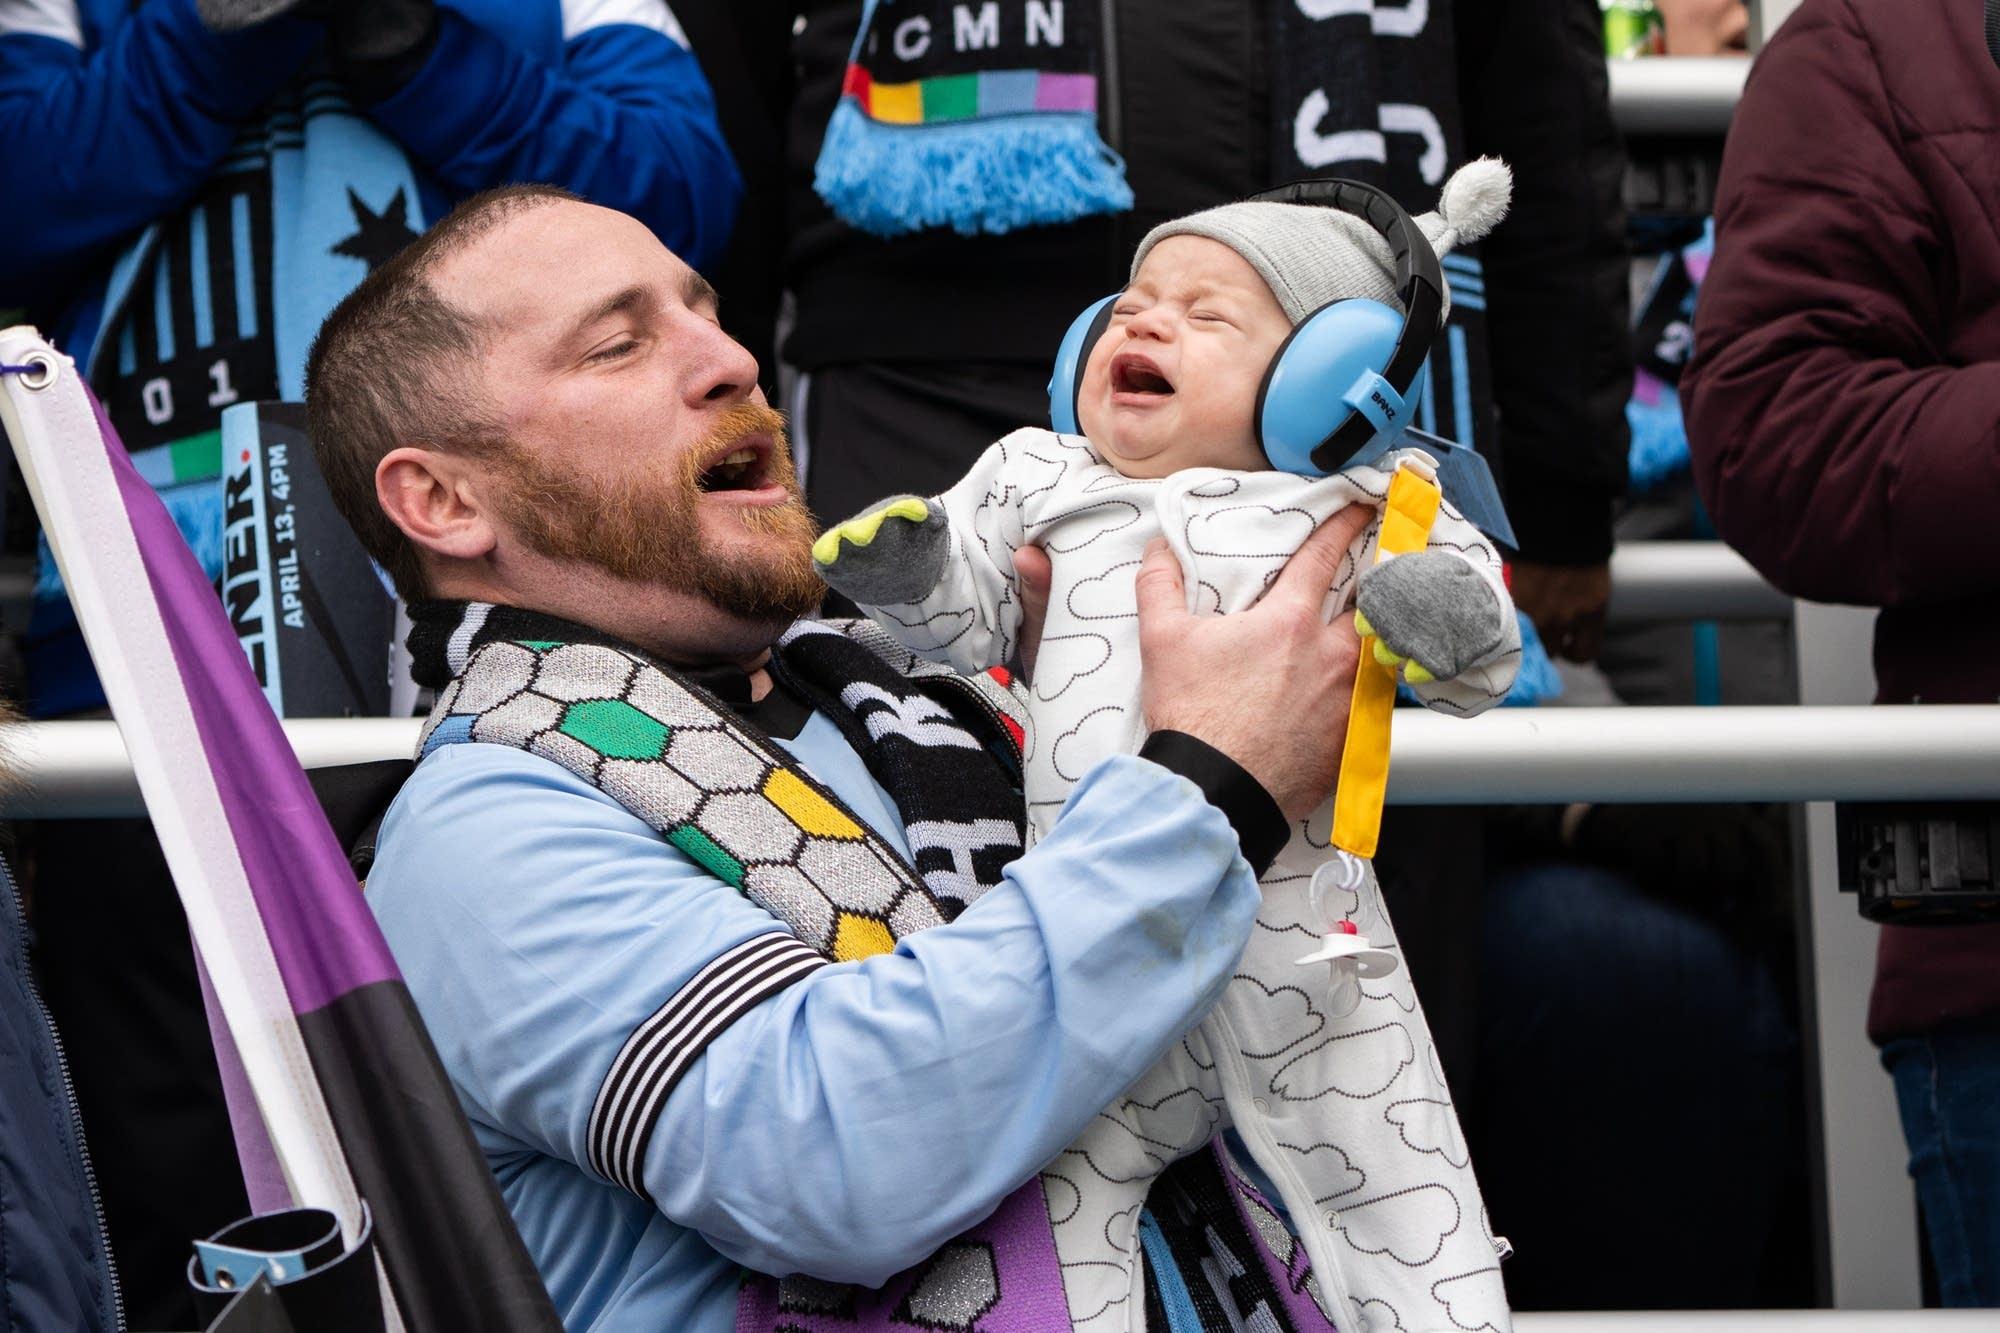 David Zeller holds 3-month-old Ragnar while cheering for Minnesota United.